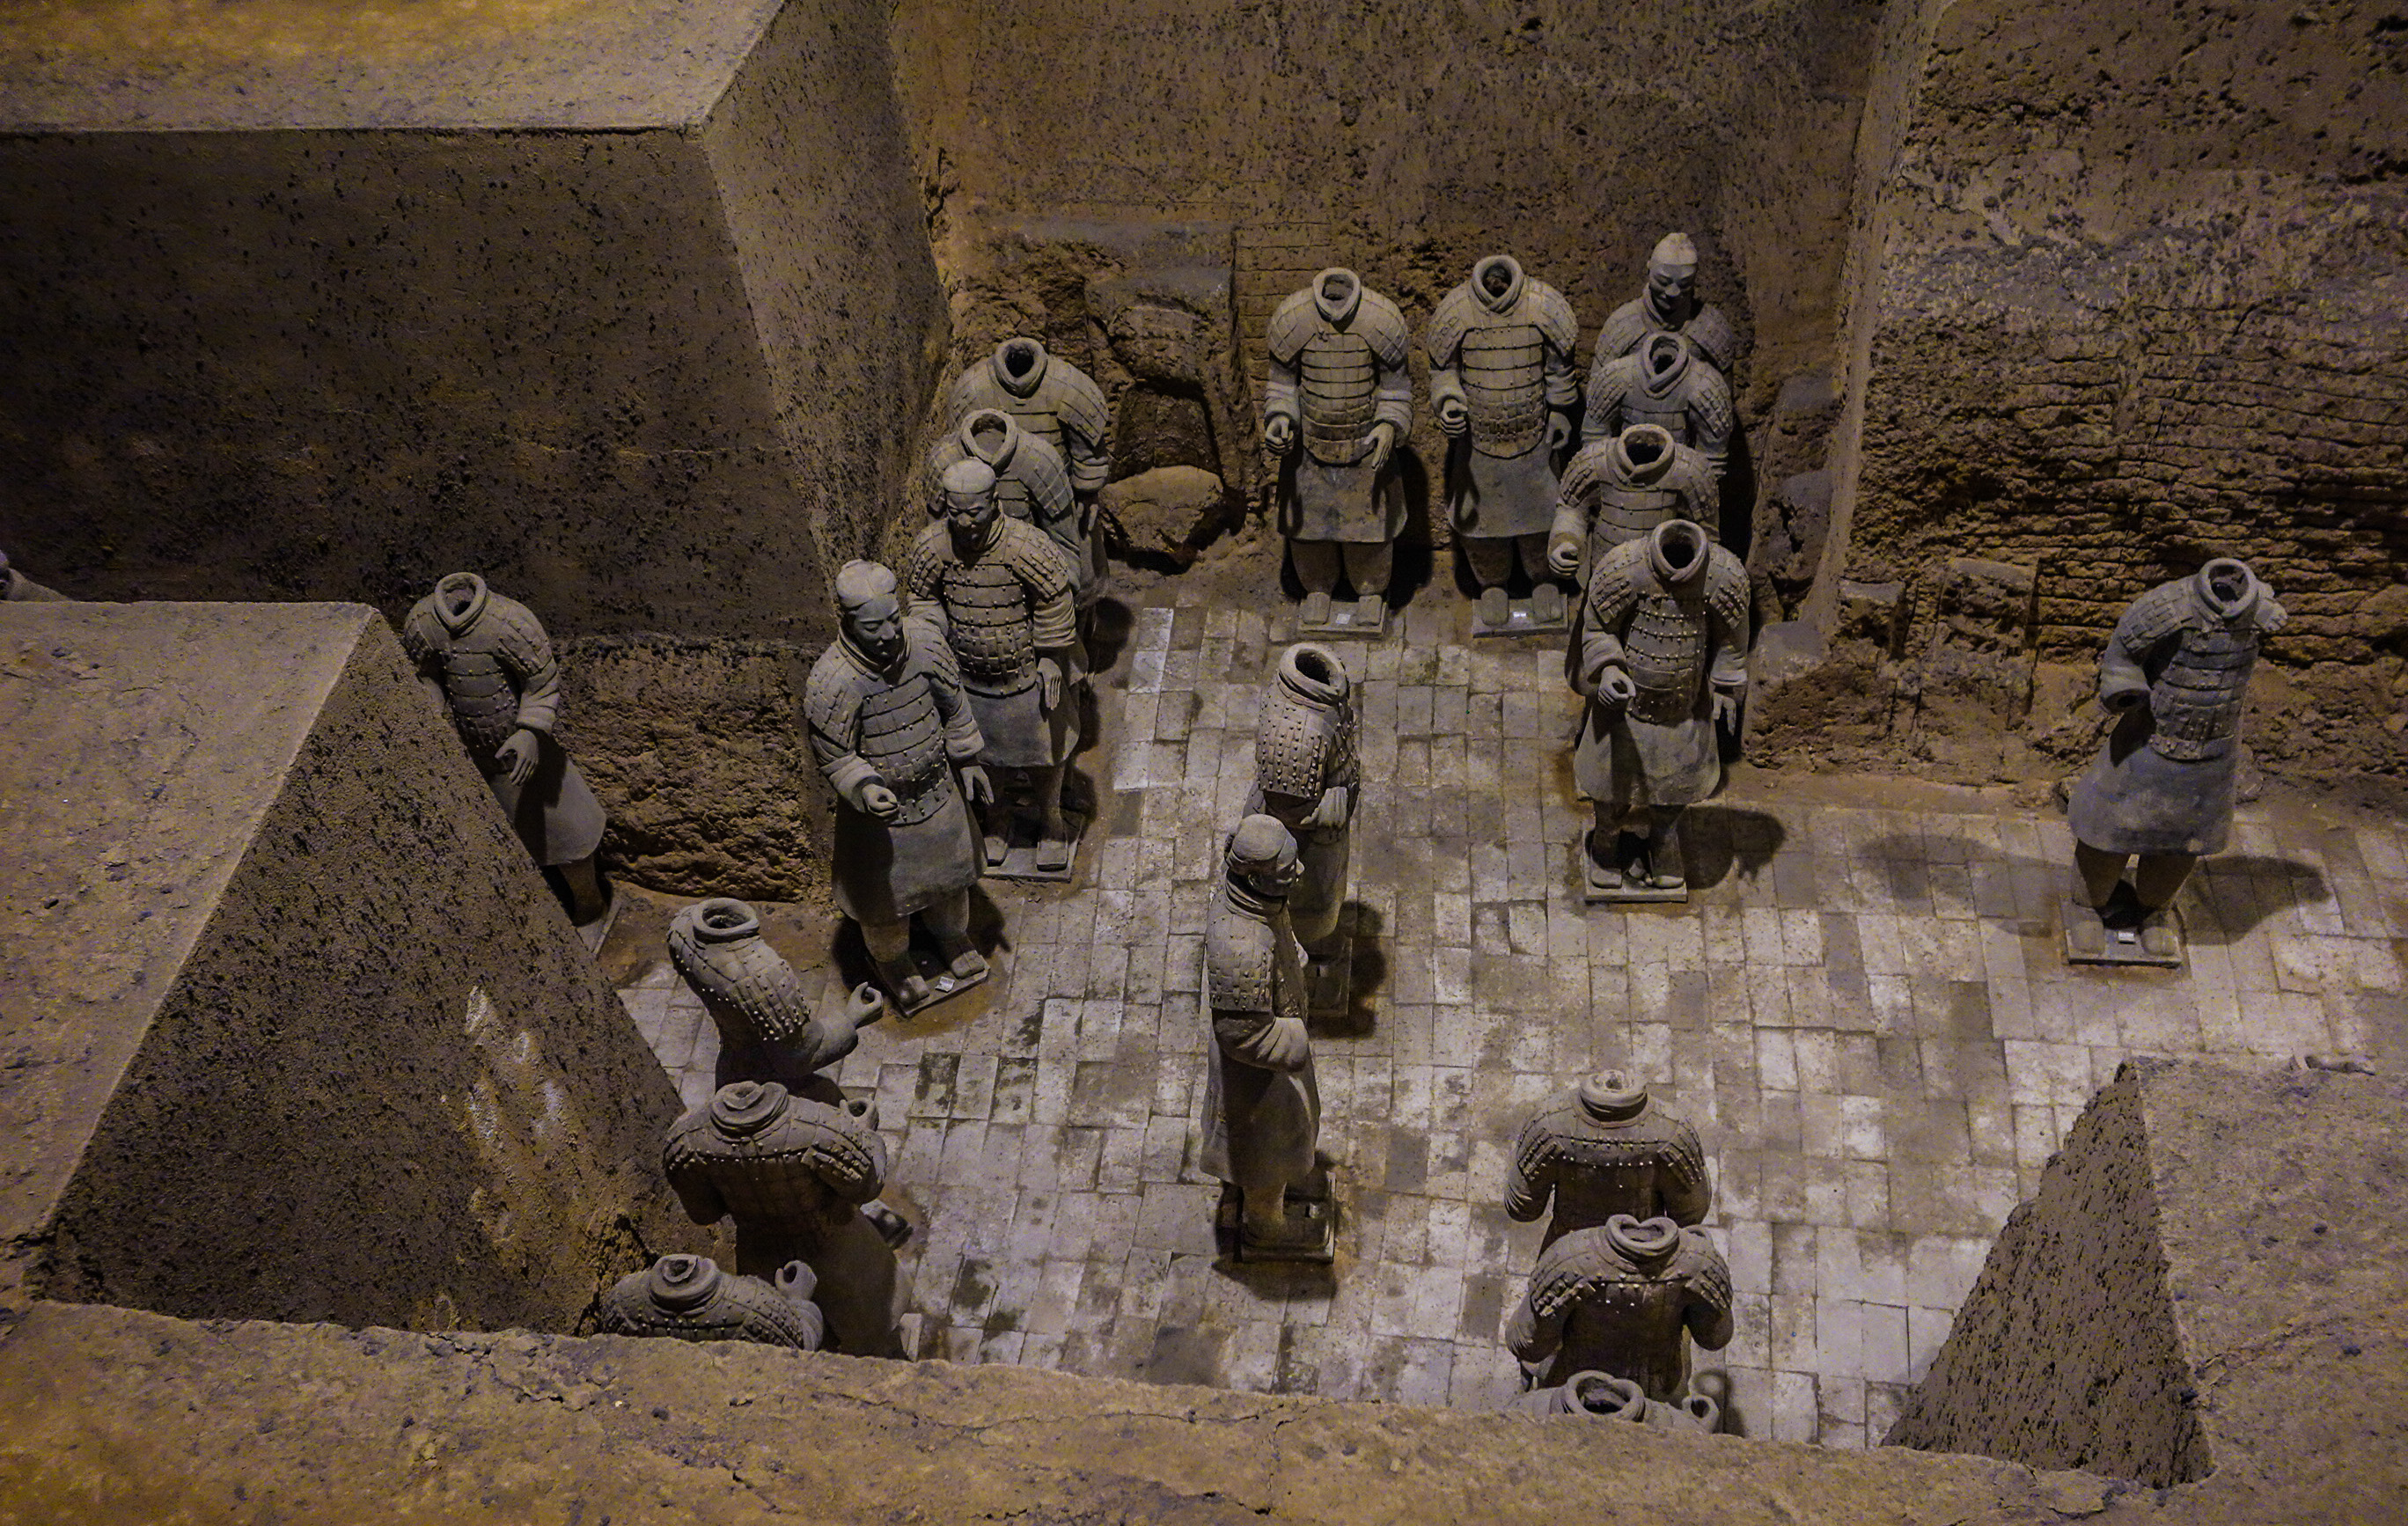 L'armée de soldats de terre cuite à Xian